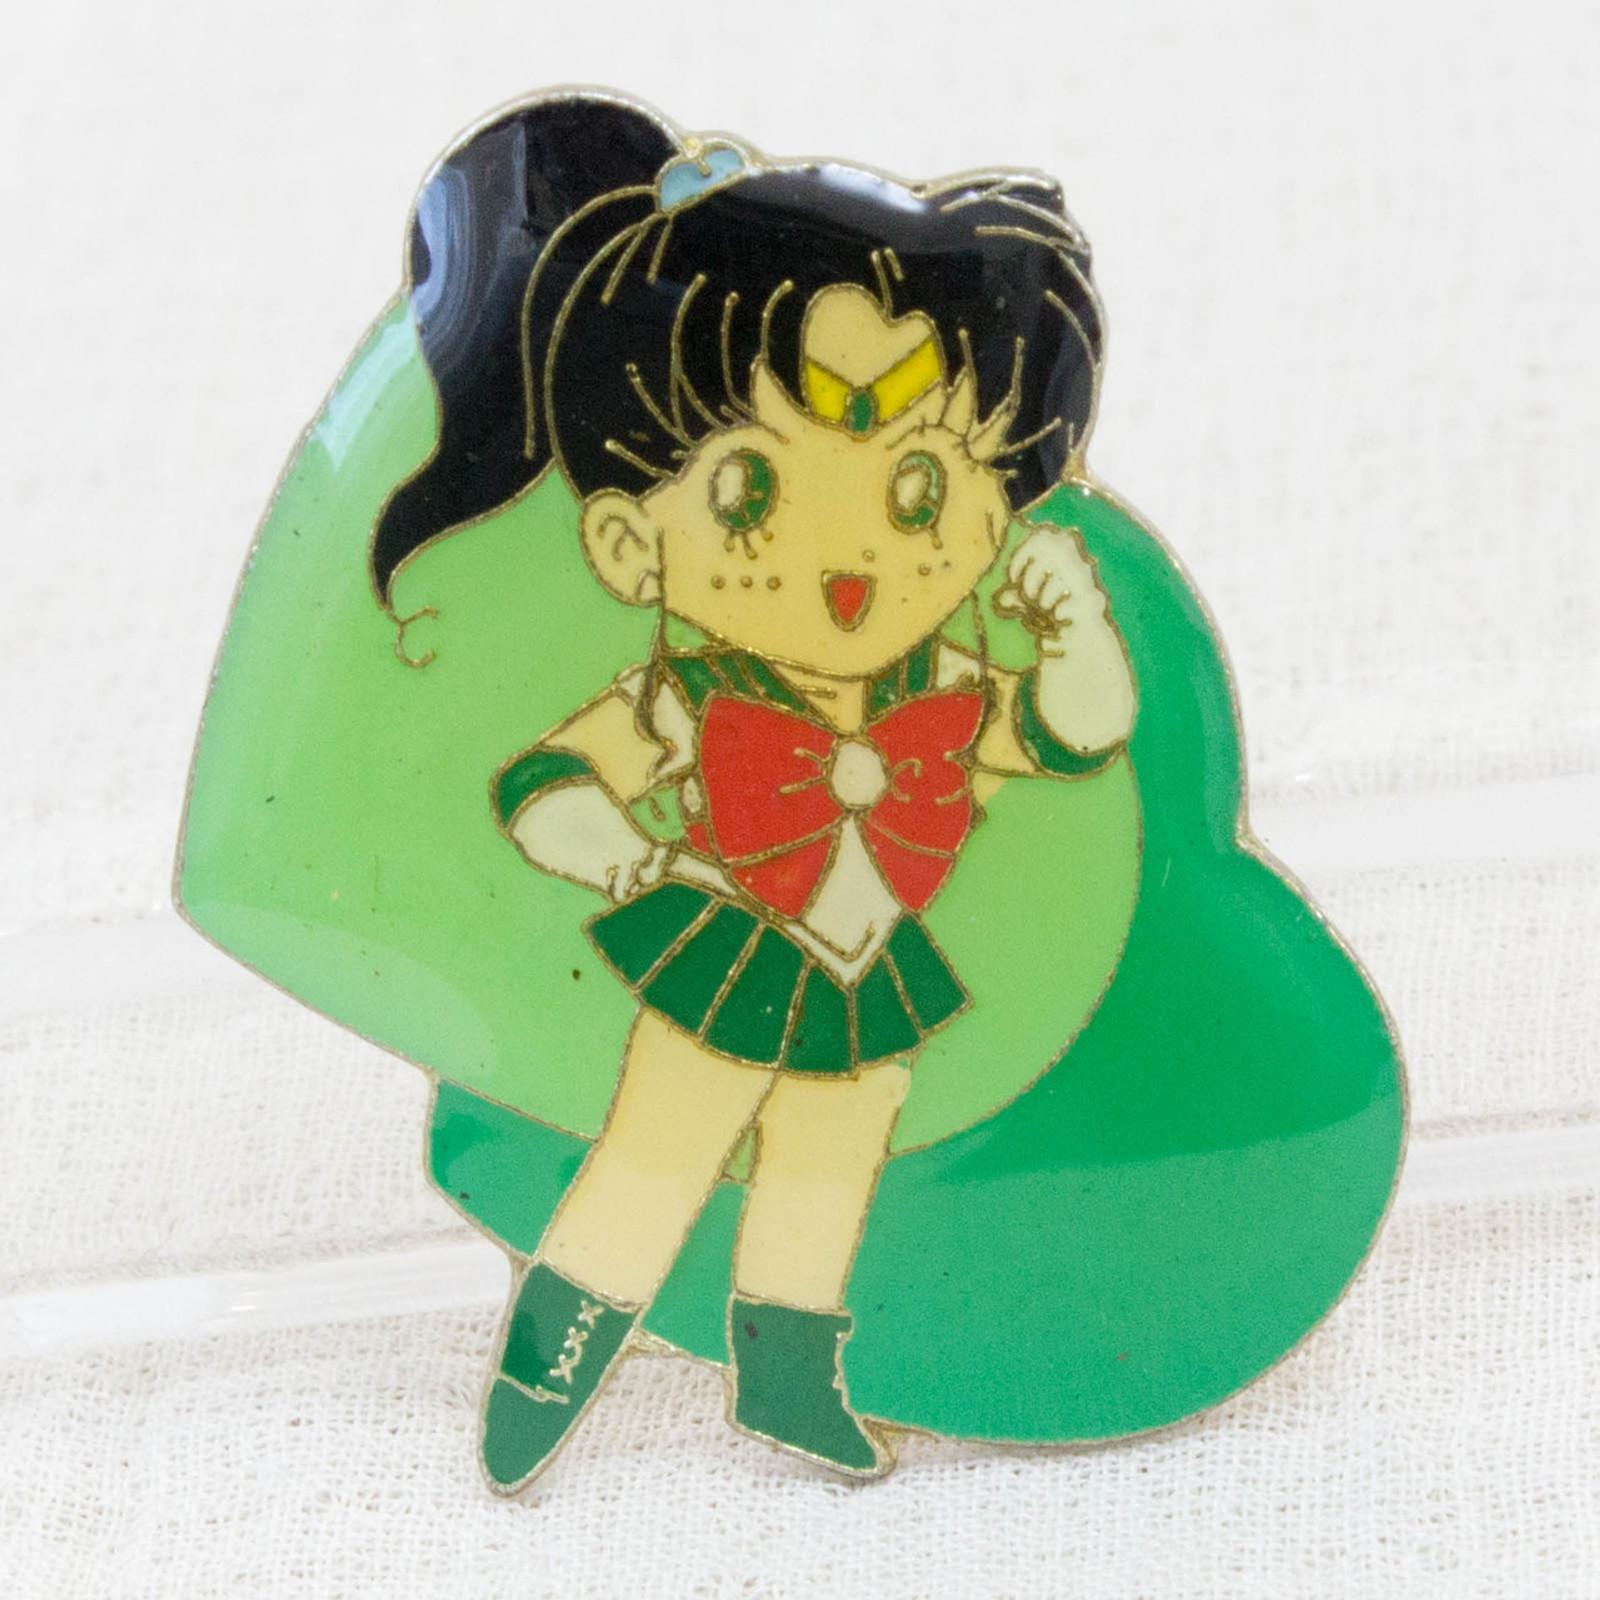 Pretty Soldier Sailor Moon Makoto Kino Jupiter Metal Pins Badge JAPAN ANIME 3